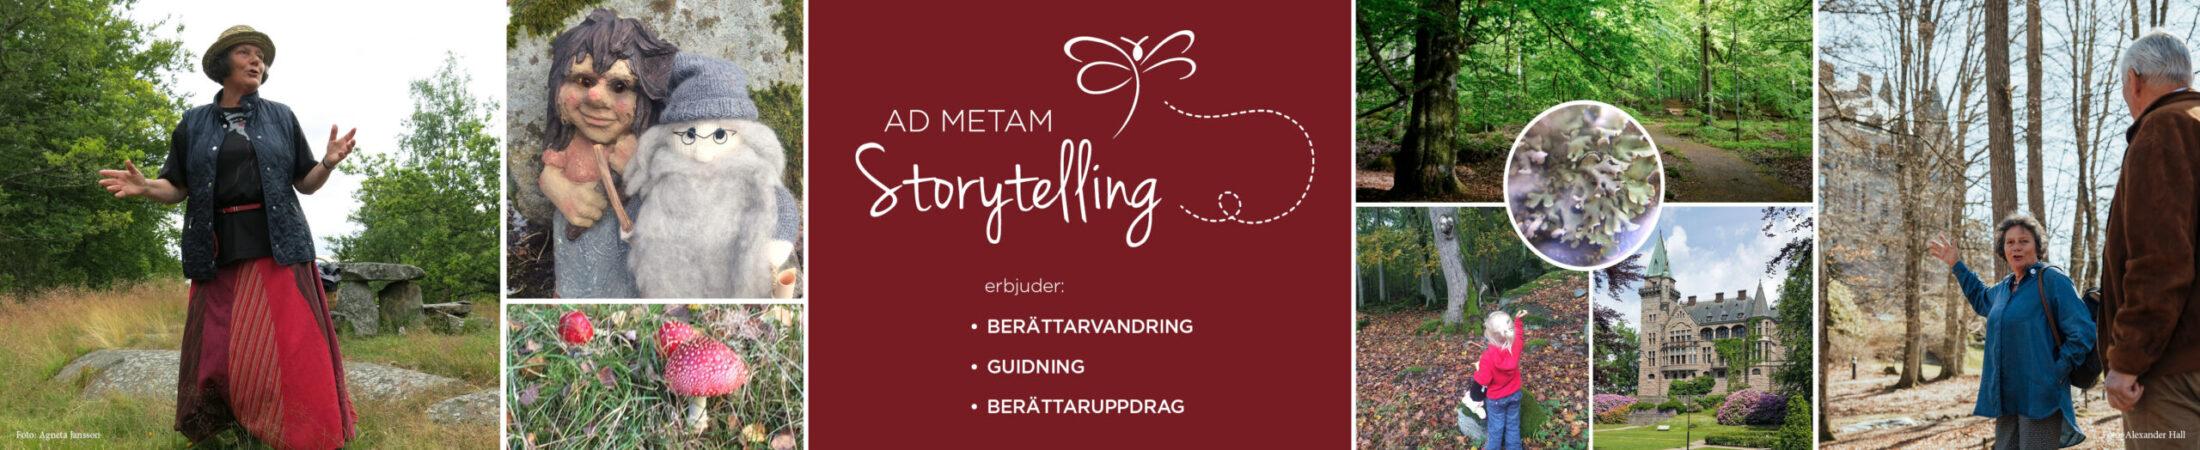 Ad Metam - Storytelling